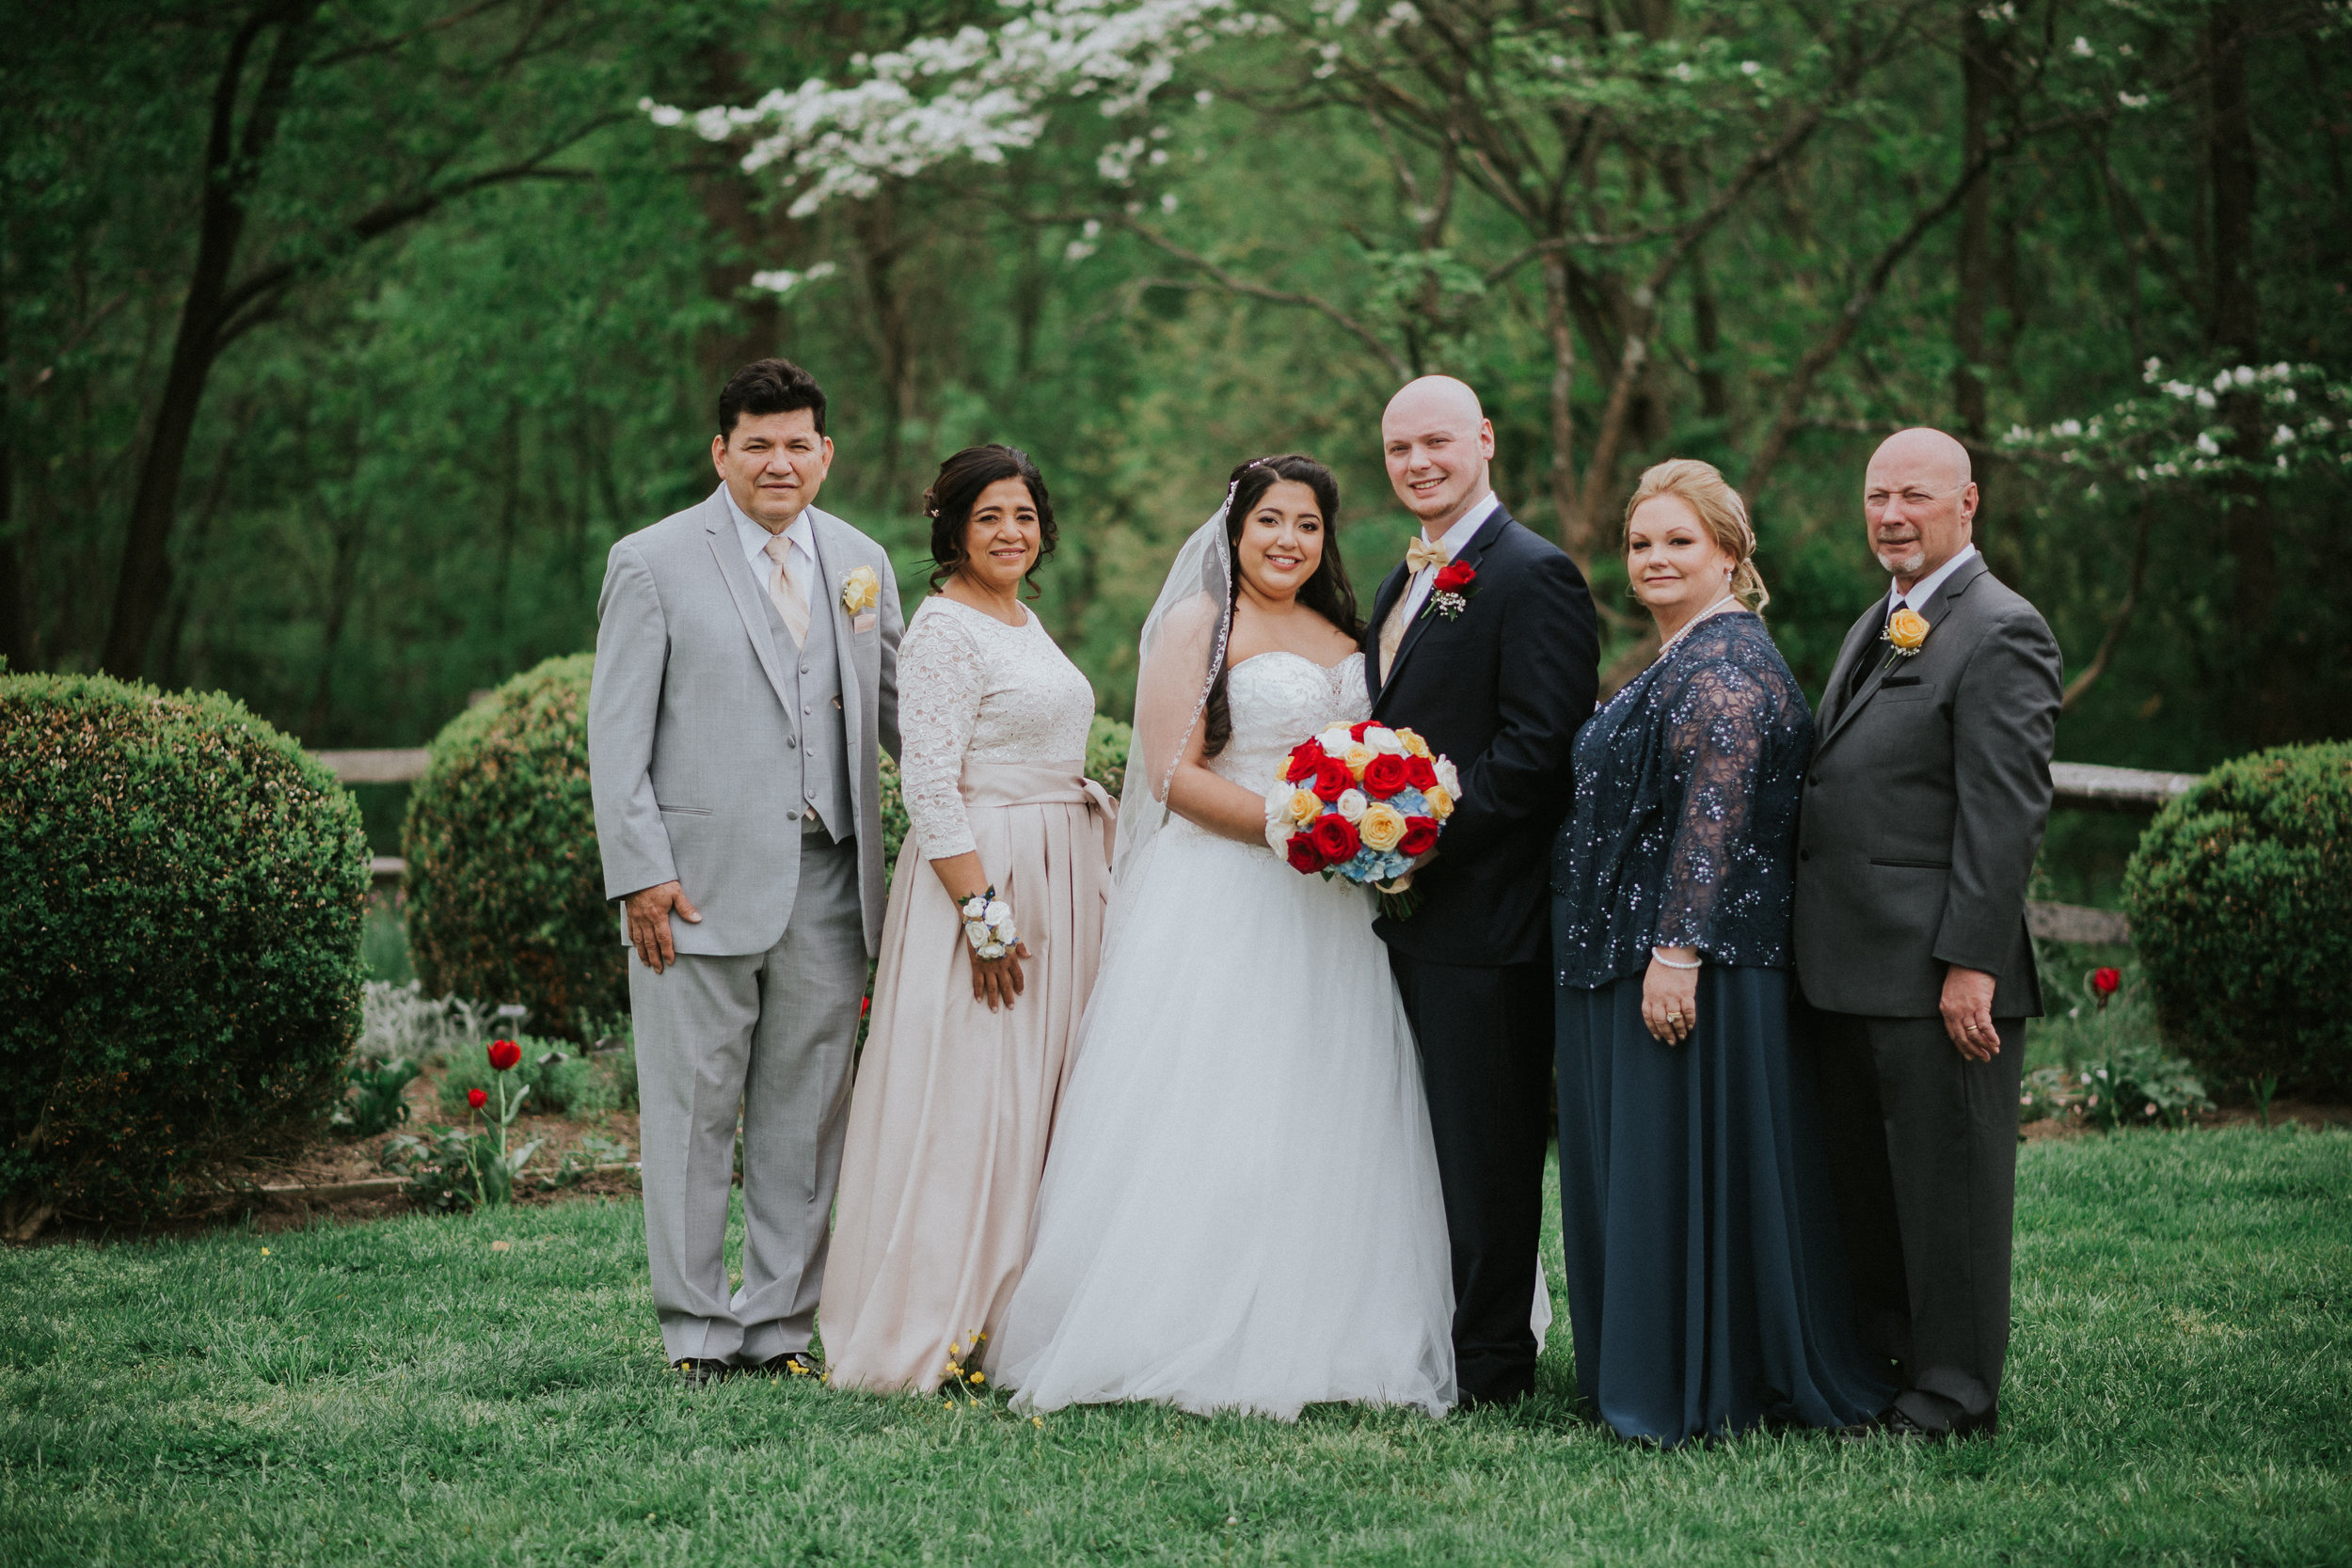 Barclay-Farmstead-Wedding-Rosa-and-Mike-396.jpg